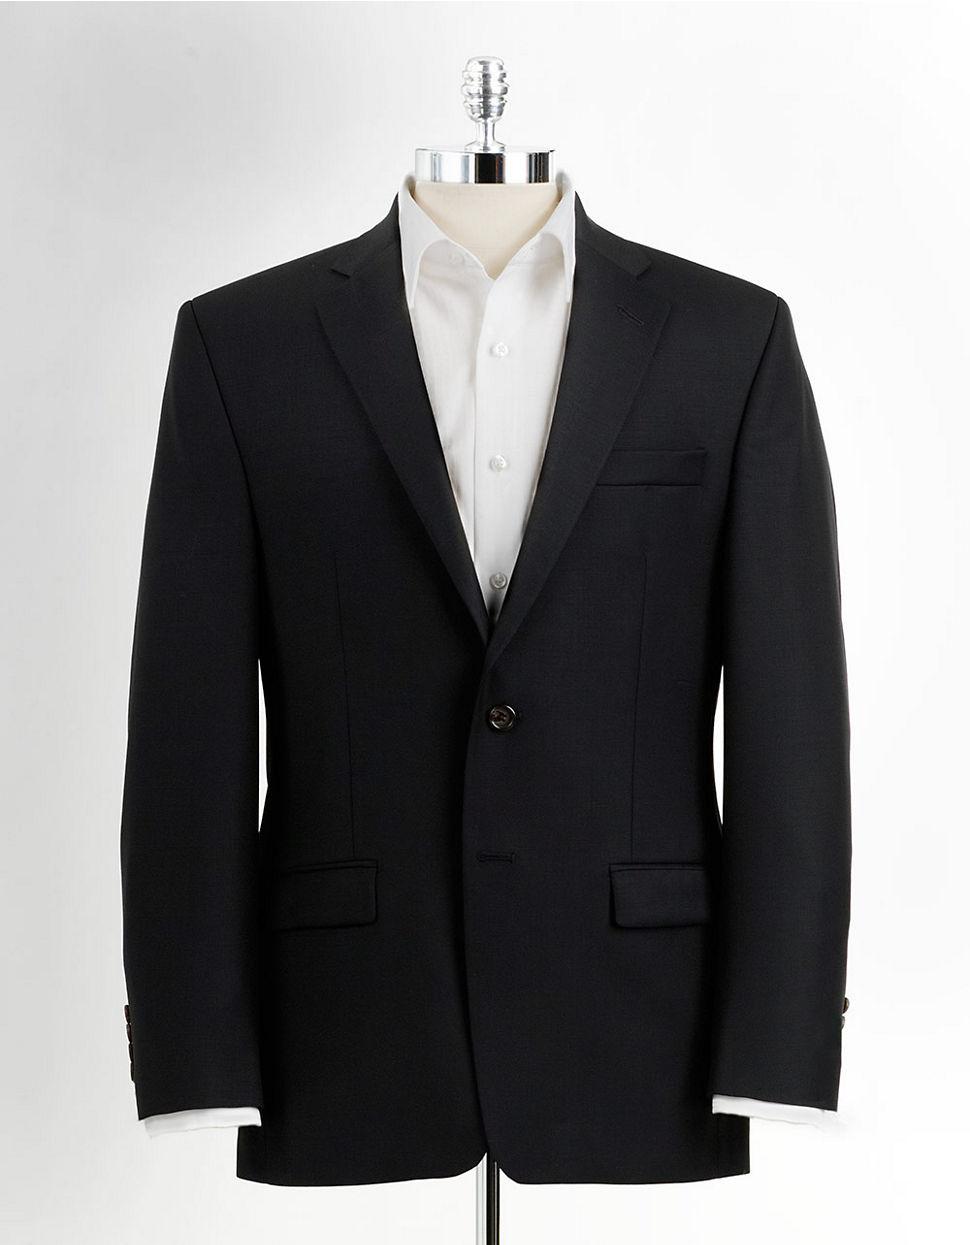 lauren by ralph lauren classic fit two button wool suit. Black Bedroom Furniture Sets. Home Design Ideas